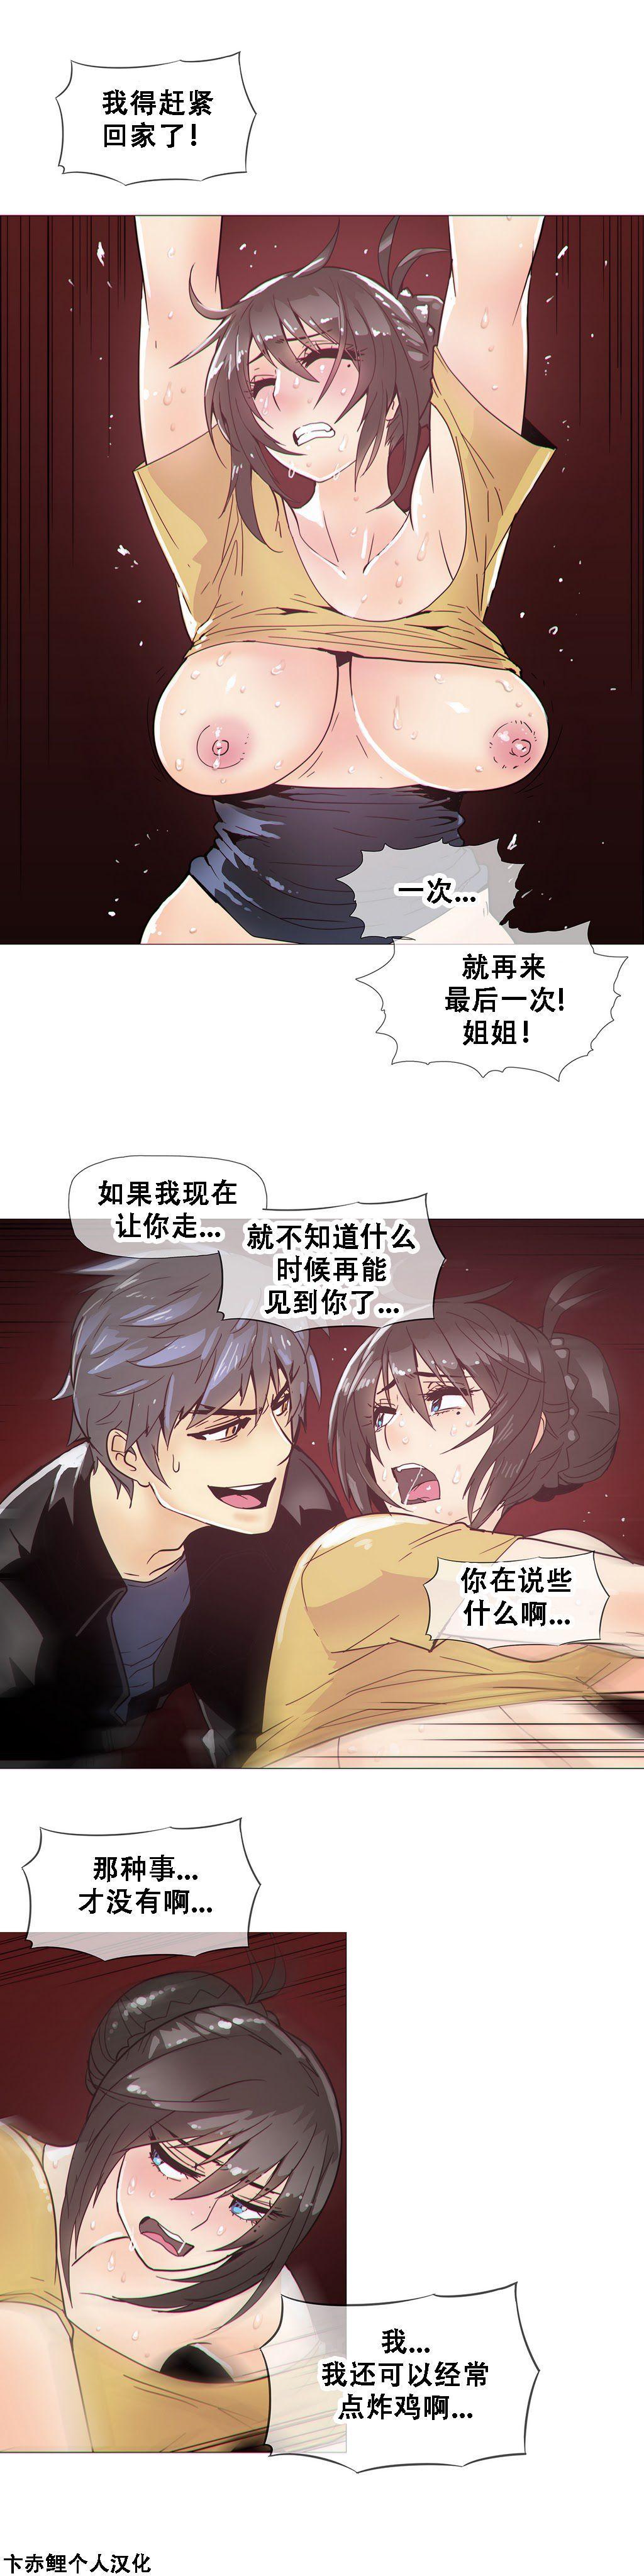 HouseHold Affairs 【卞赤鲤个人汉化】1~33话(持续更新中) 341